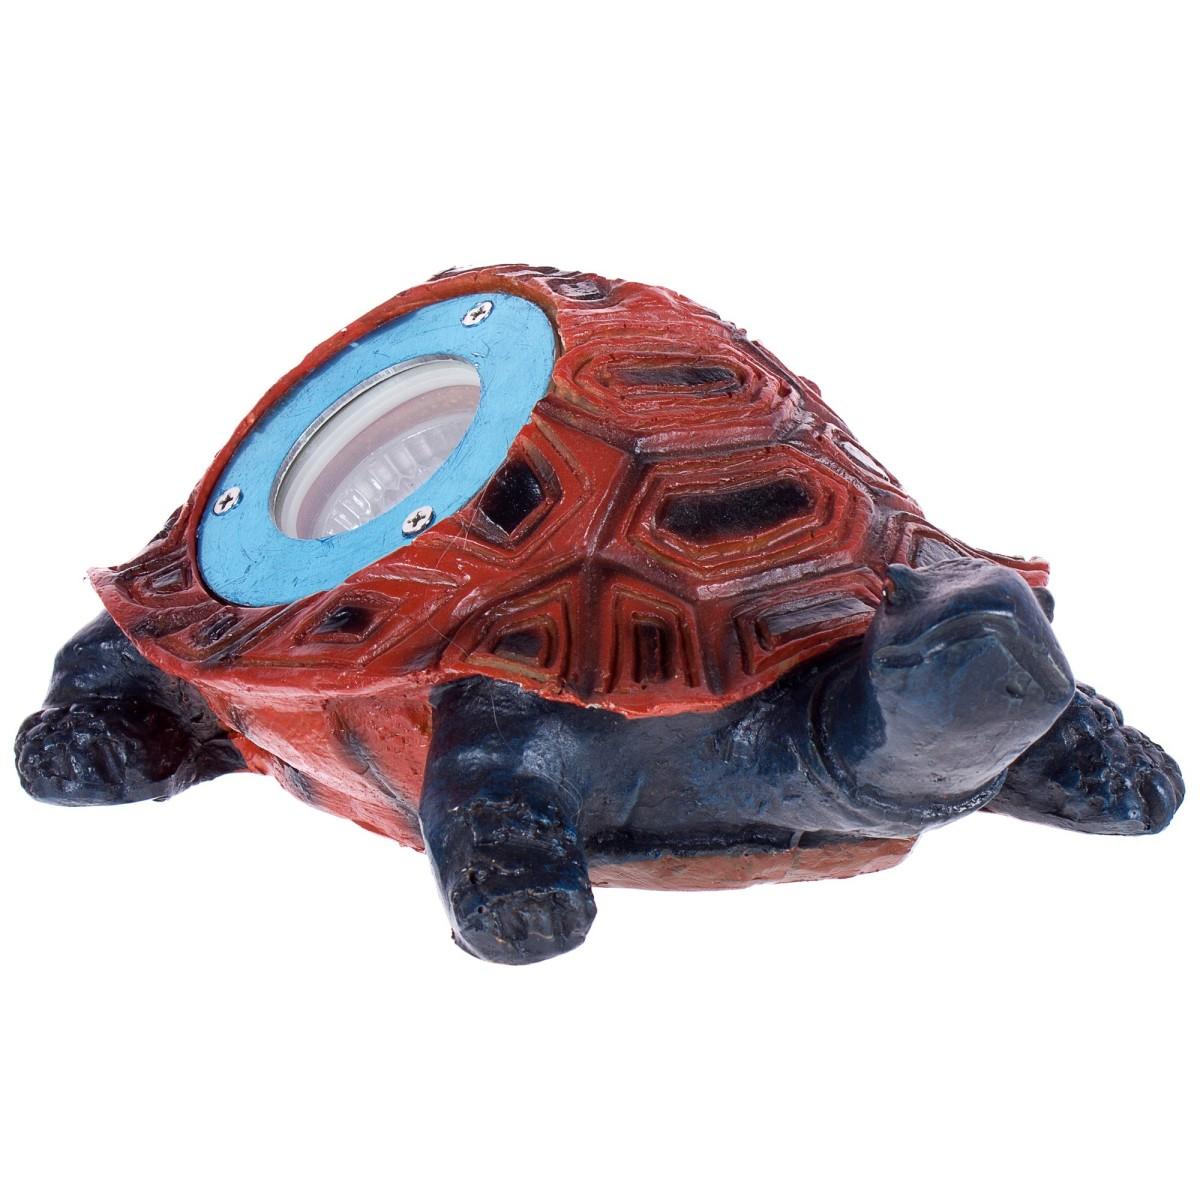 Светильник на солнечных батареях Черепаха